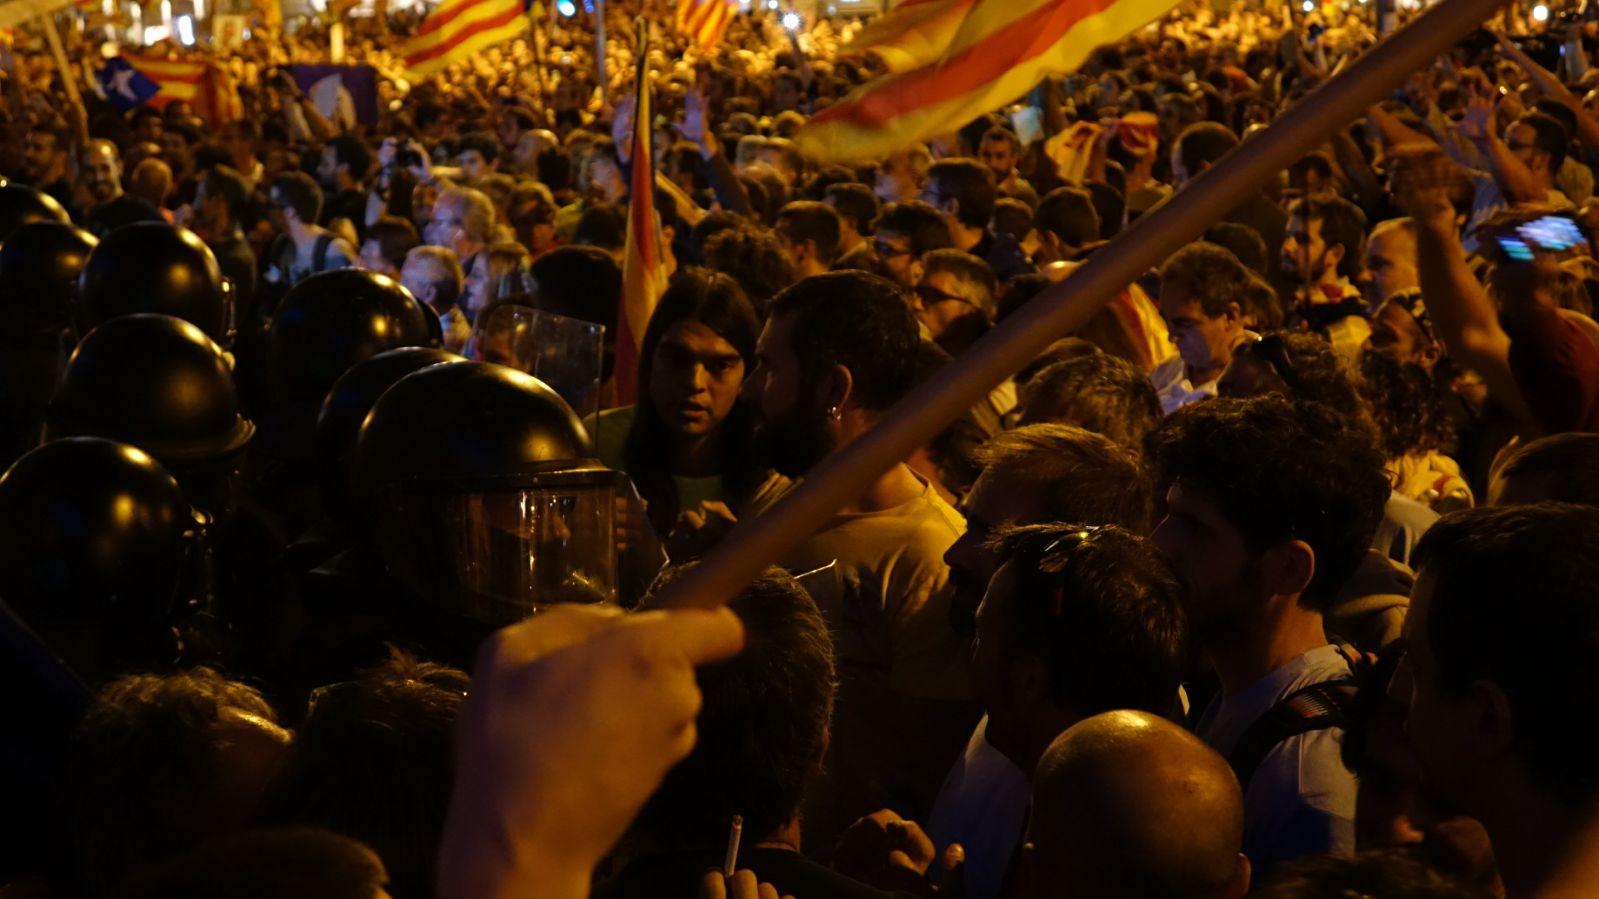 mossos manifestacio 20S economia nit - roberto lazaro